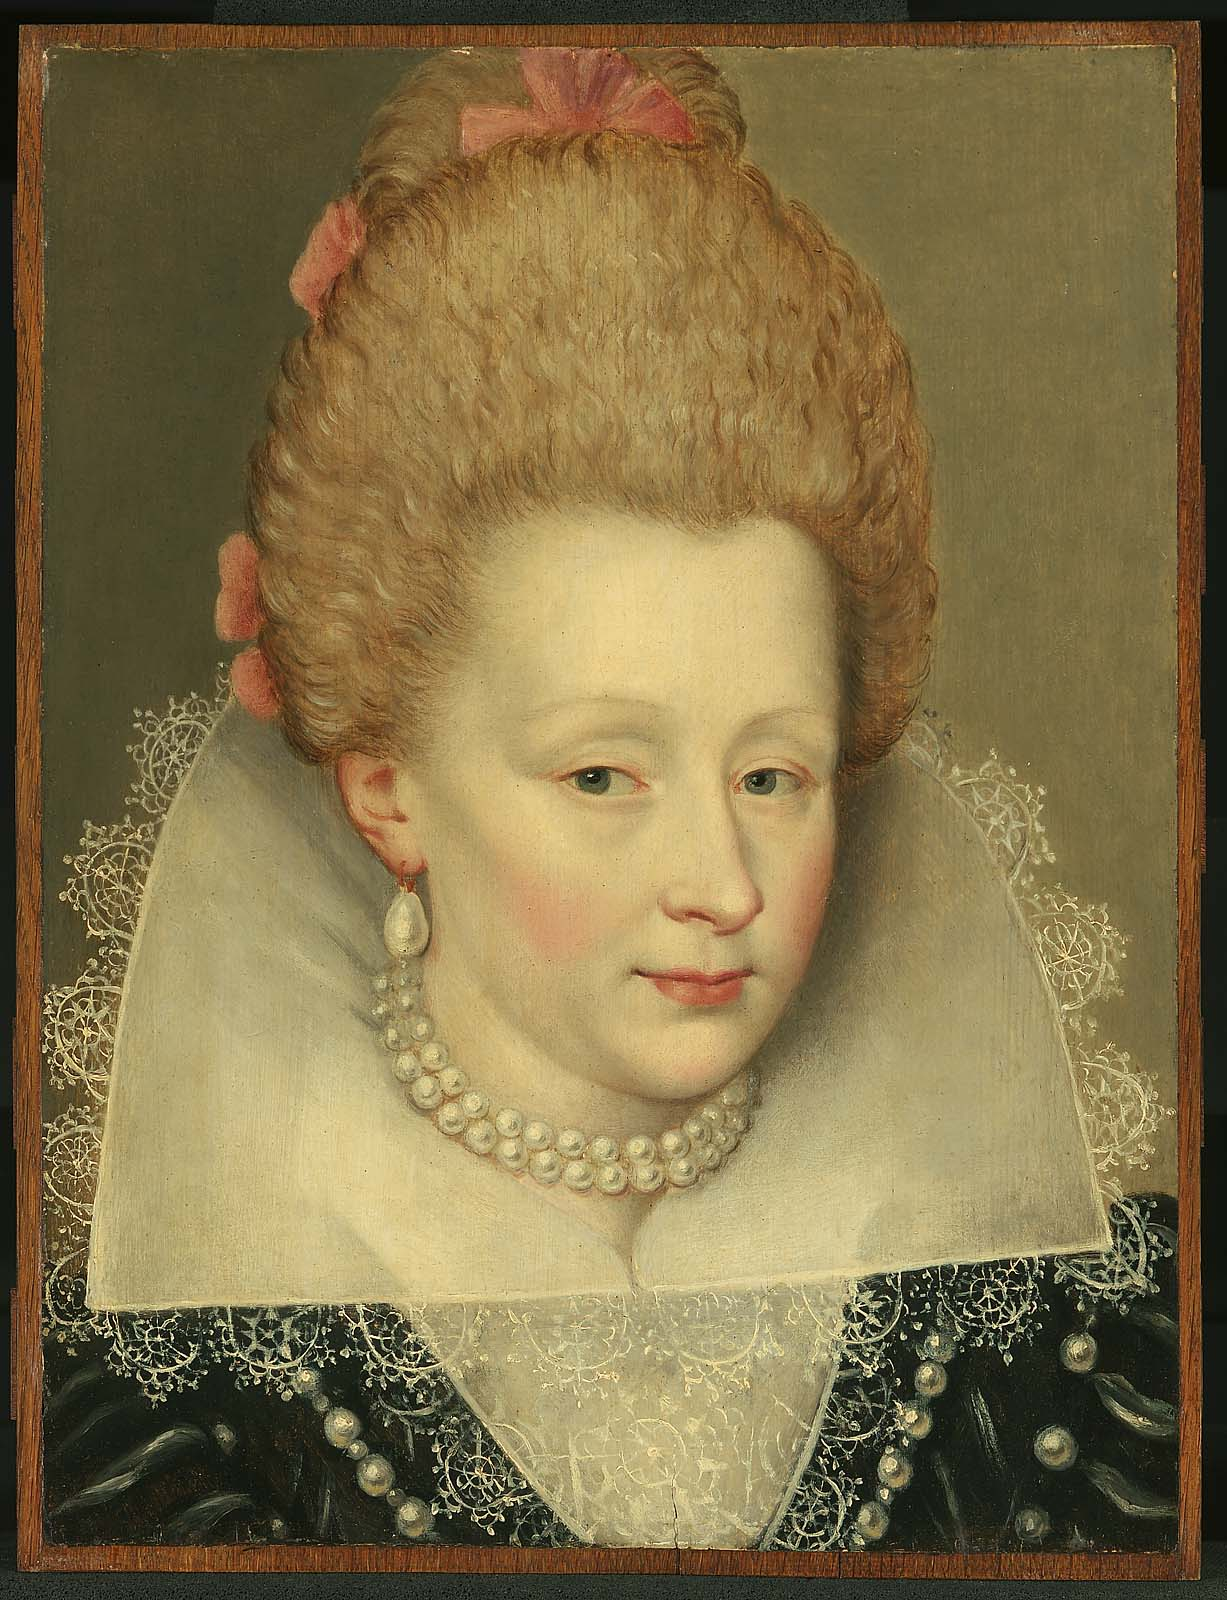 Etienne_Dumonstier_-_Portrait_of_a_Woman_-_65.2642_-_Museum_of_Fine_Arts